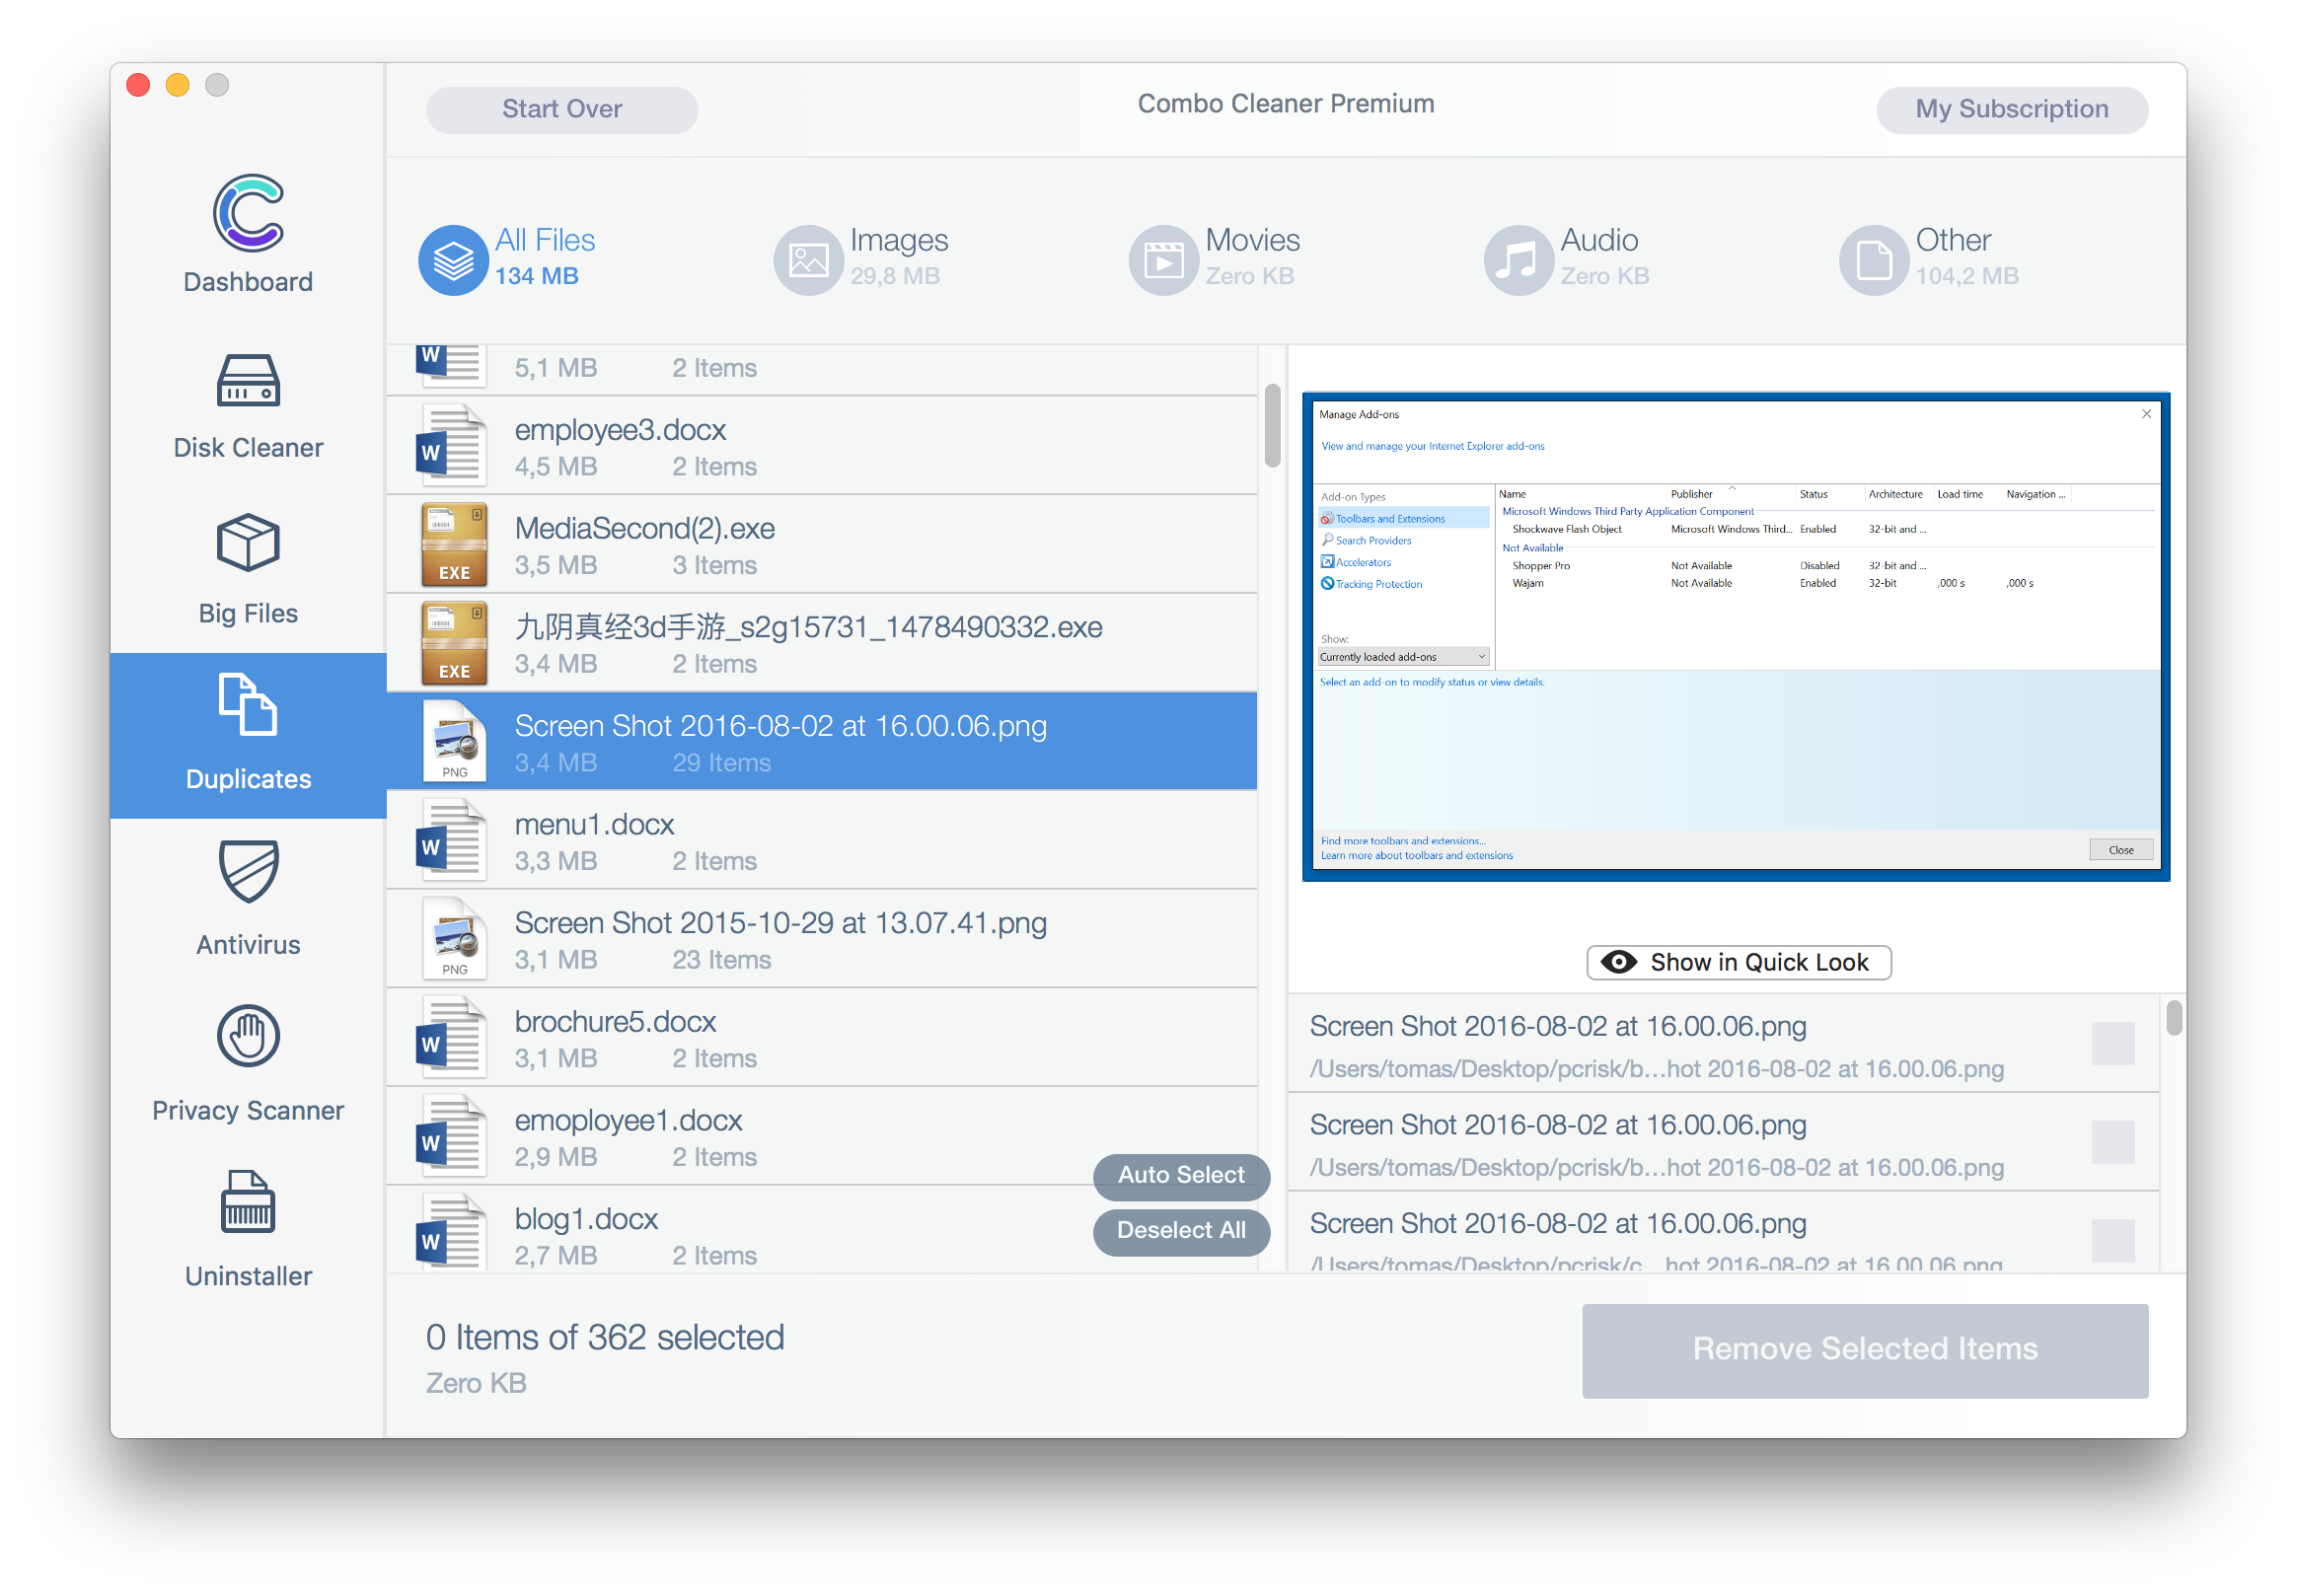 download-tai-combo-cleaner-premium-full-diet-virus-malware-cho-mac-tot-nhat